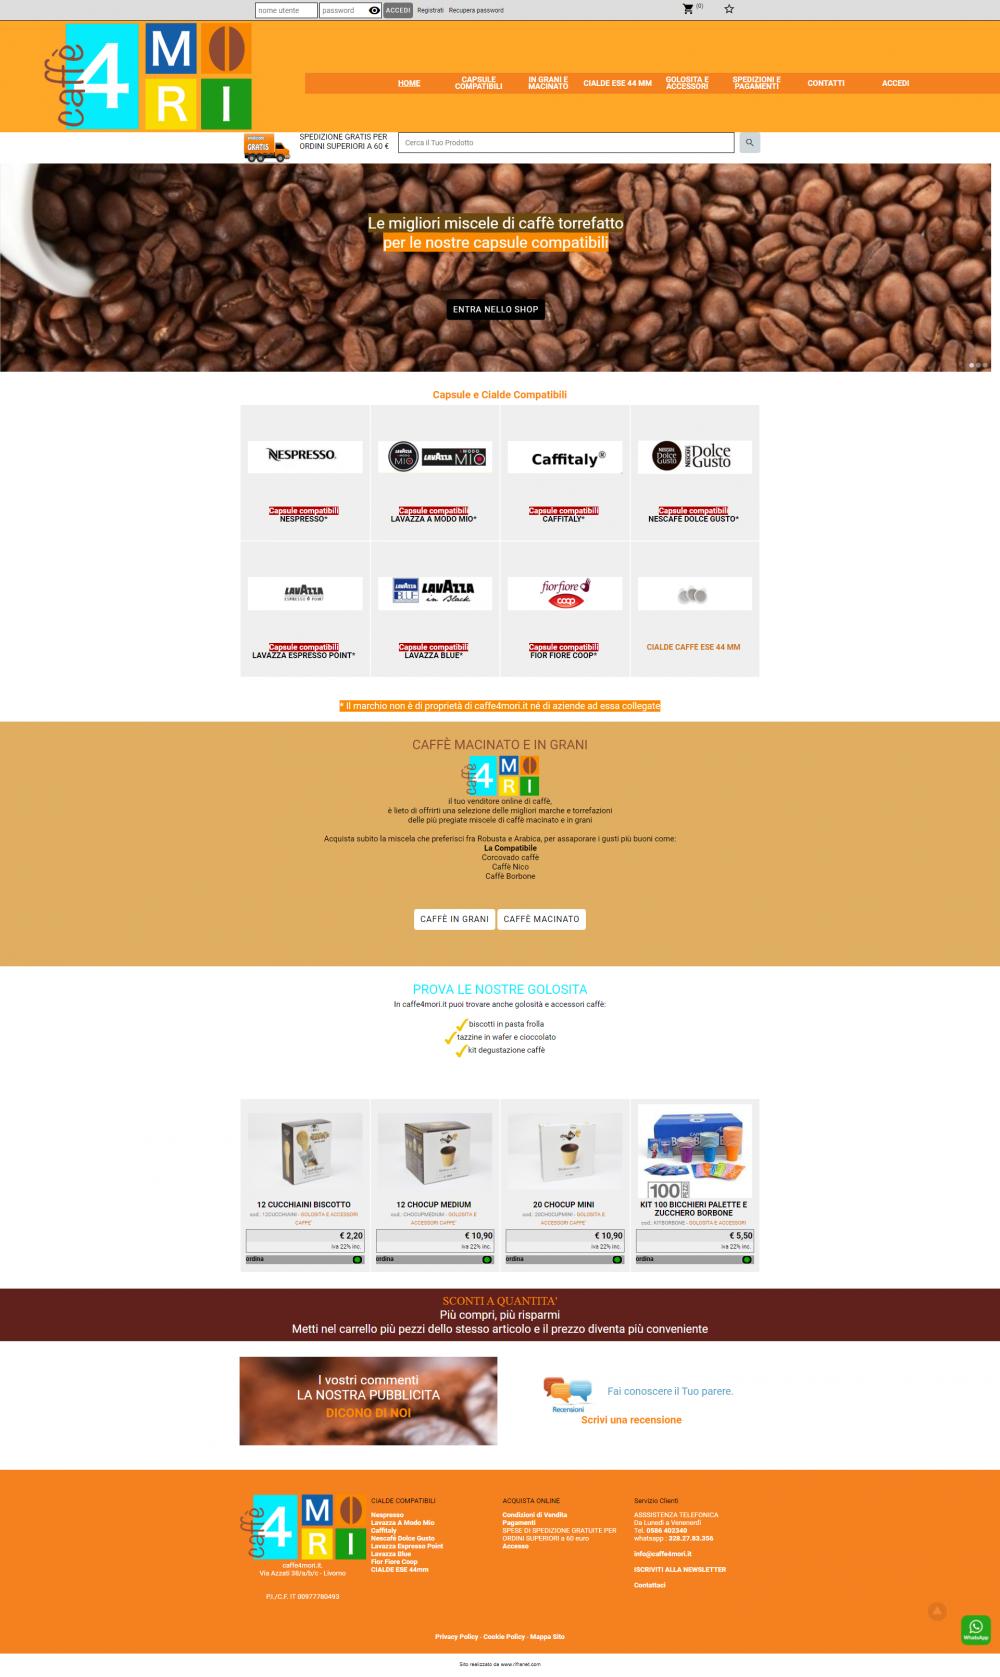 www.caffe4mori.it dopo il restyling